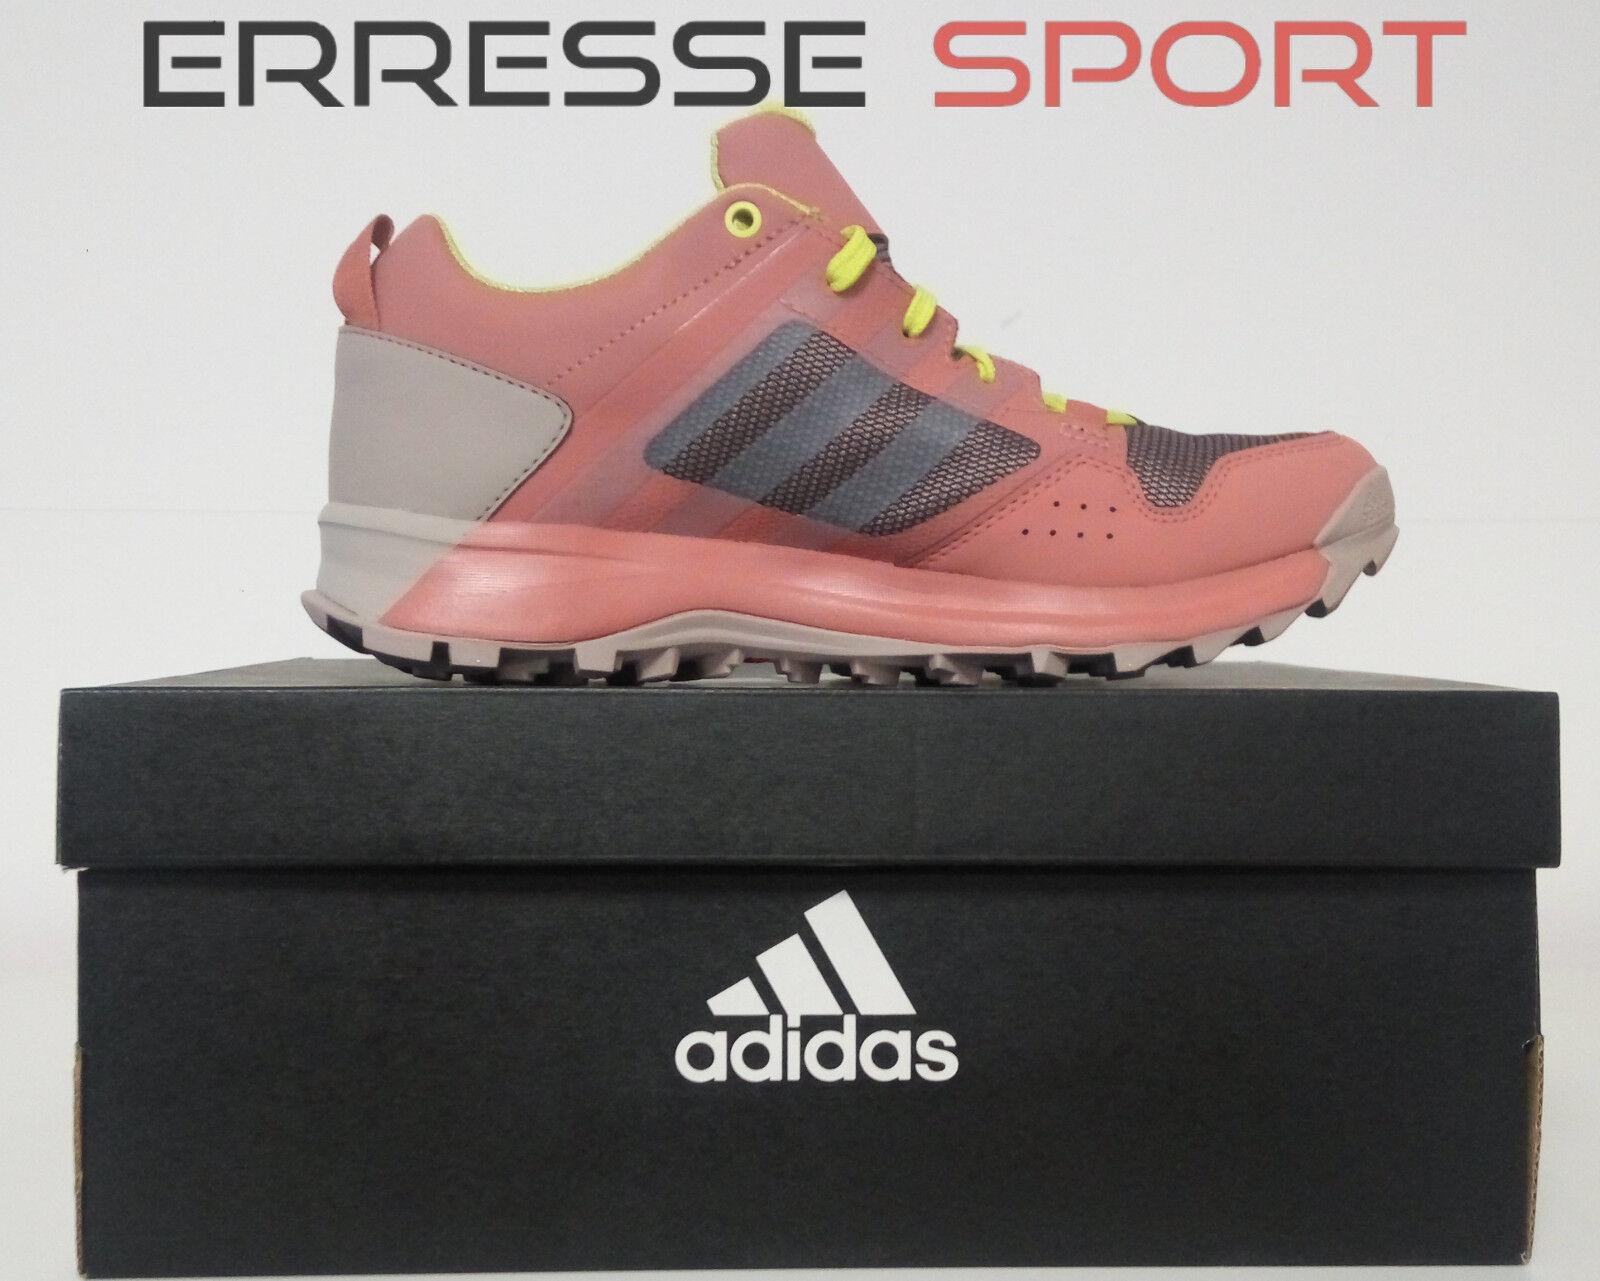 Adidas Kanadia Goretex Trail impermeabili Running corsa cross escursione impermeabili Trail donna 02a6af